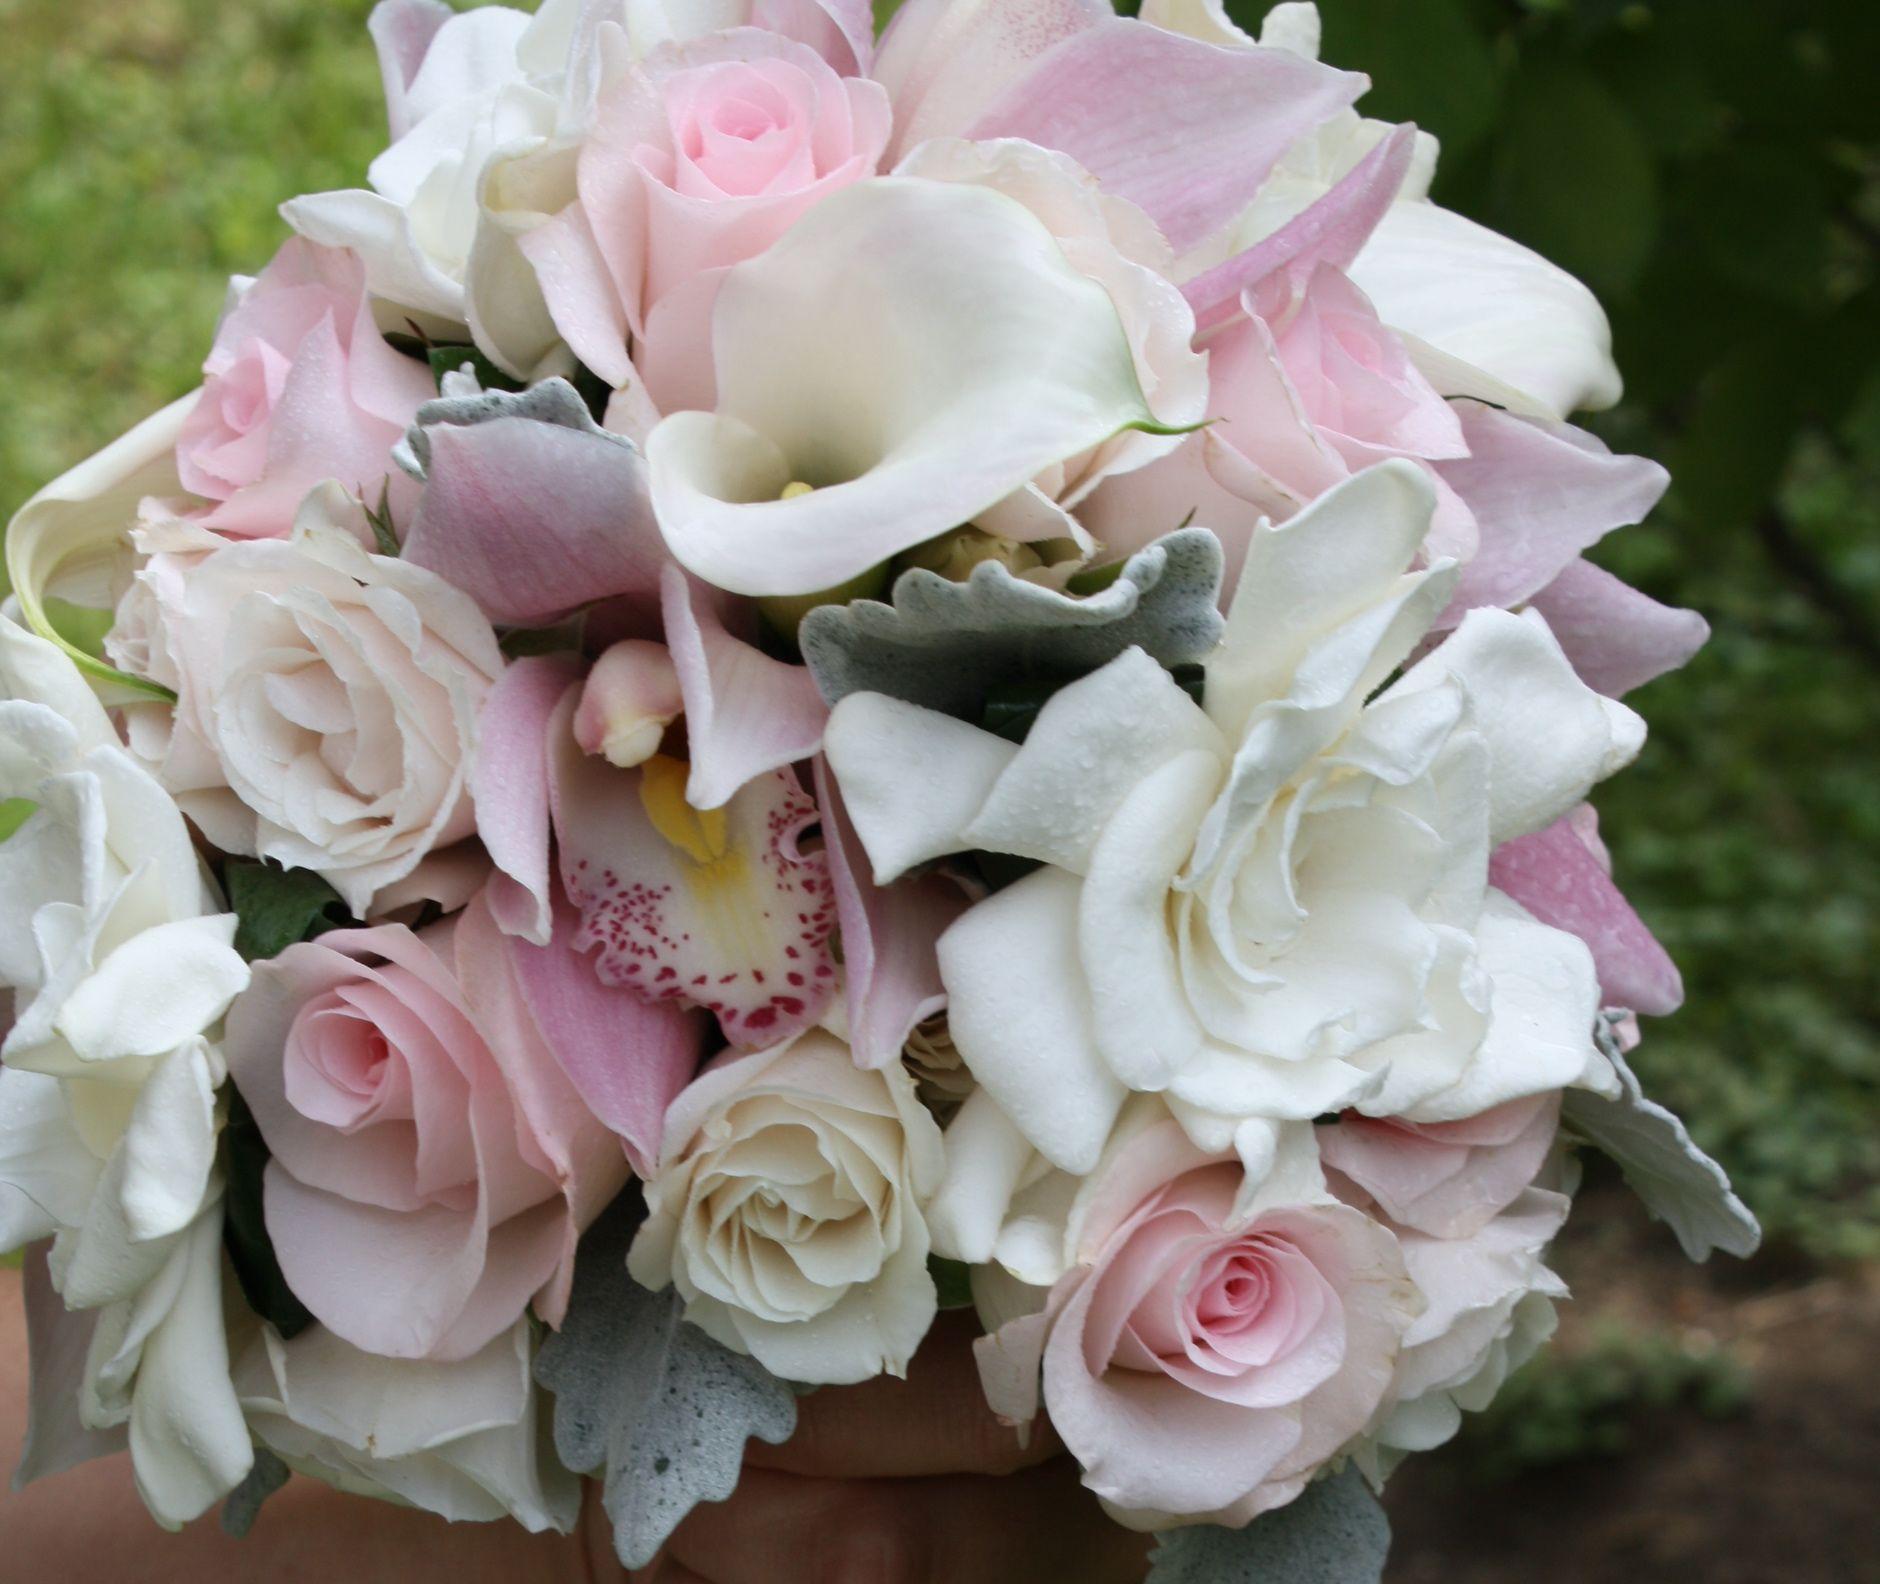 Calla Lily Gardenia Light Pink Rose Cymbidium Orchid Spray